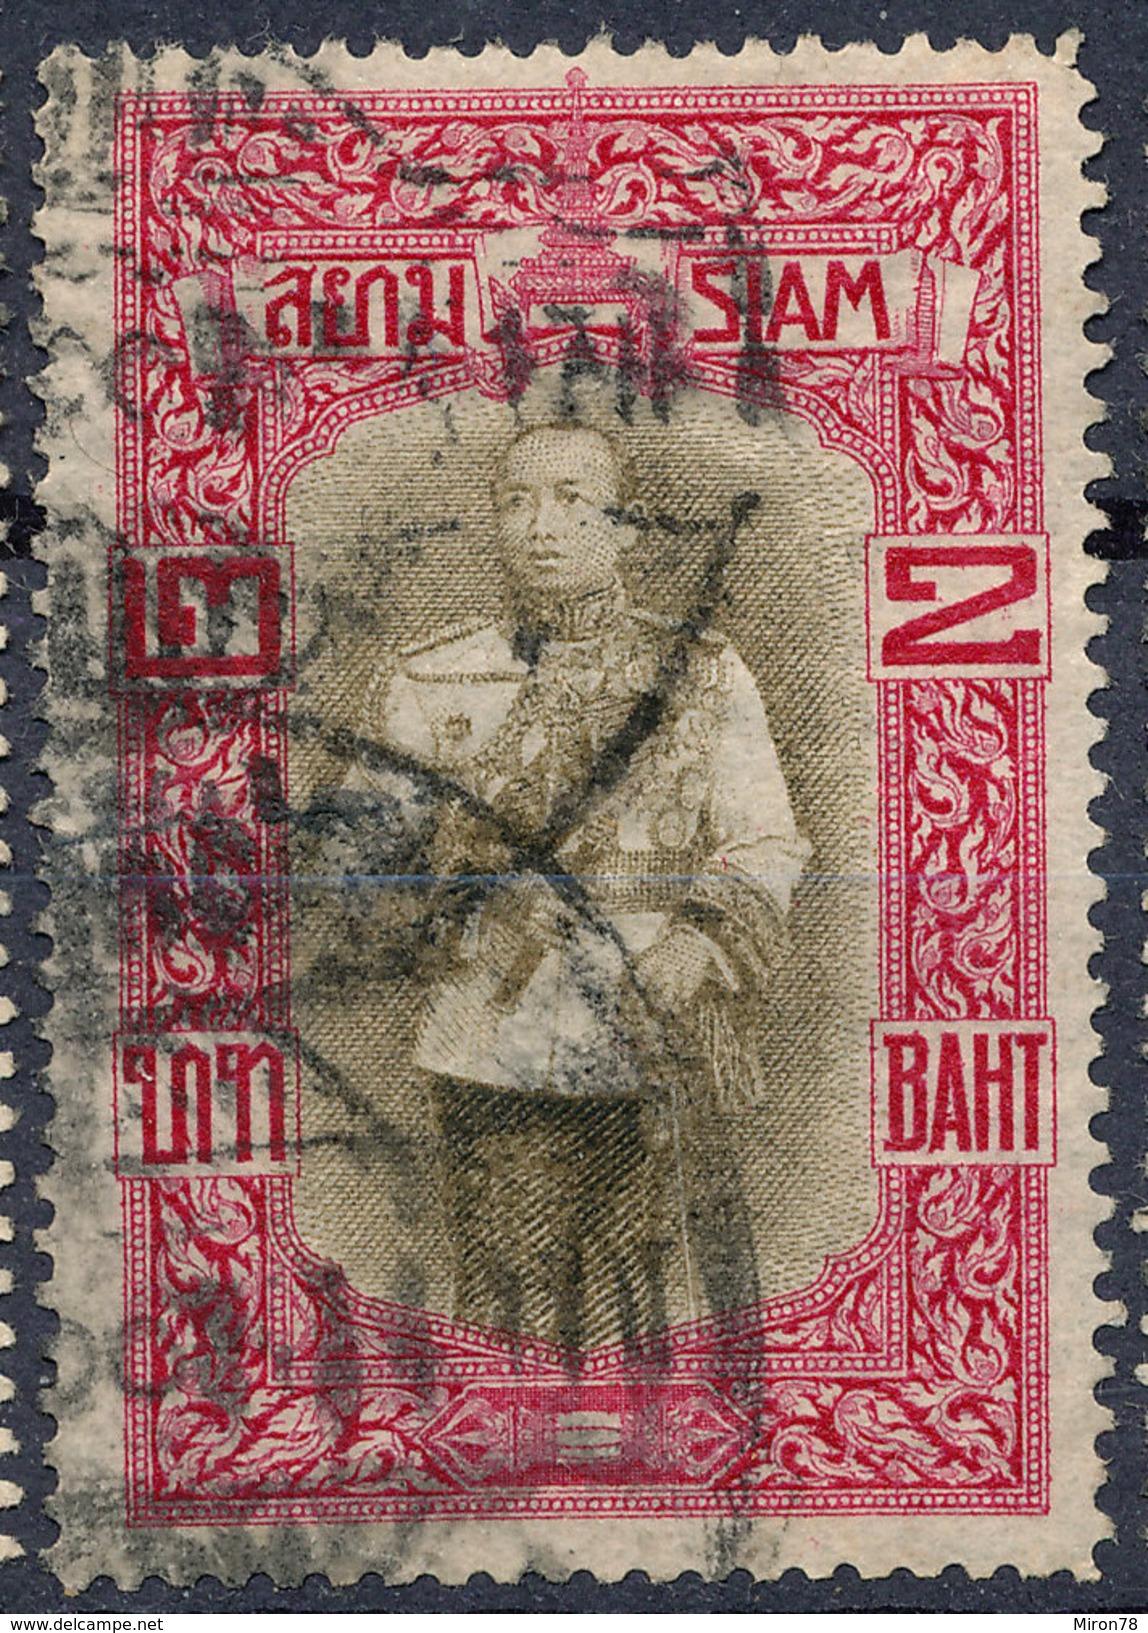 Stamp  THAILAND,SIAM 1912 2b Scott#152 Lot#46 - Siam